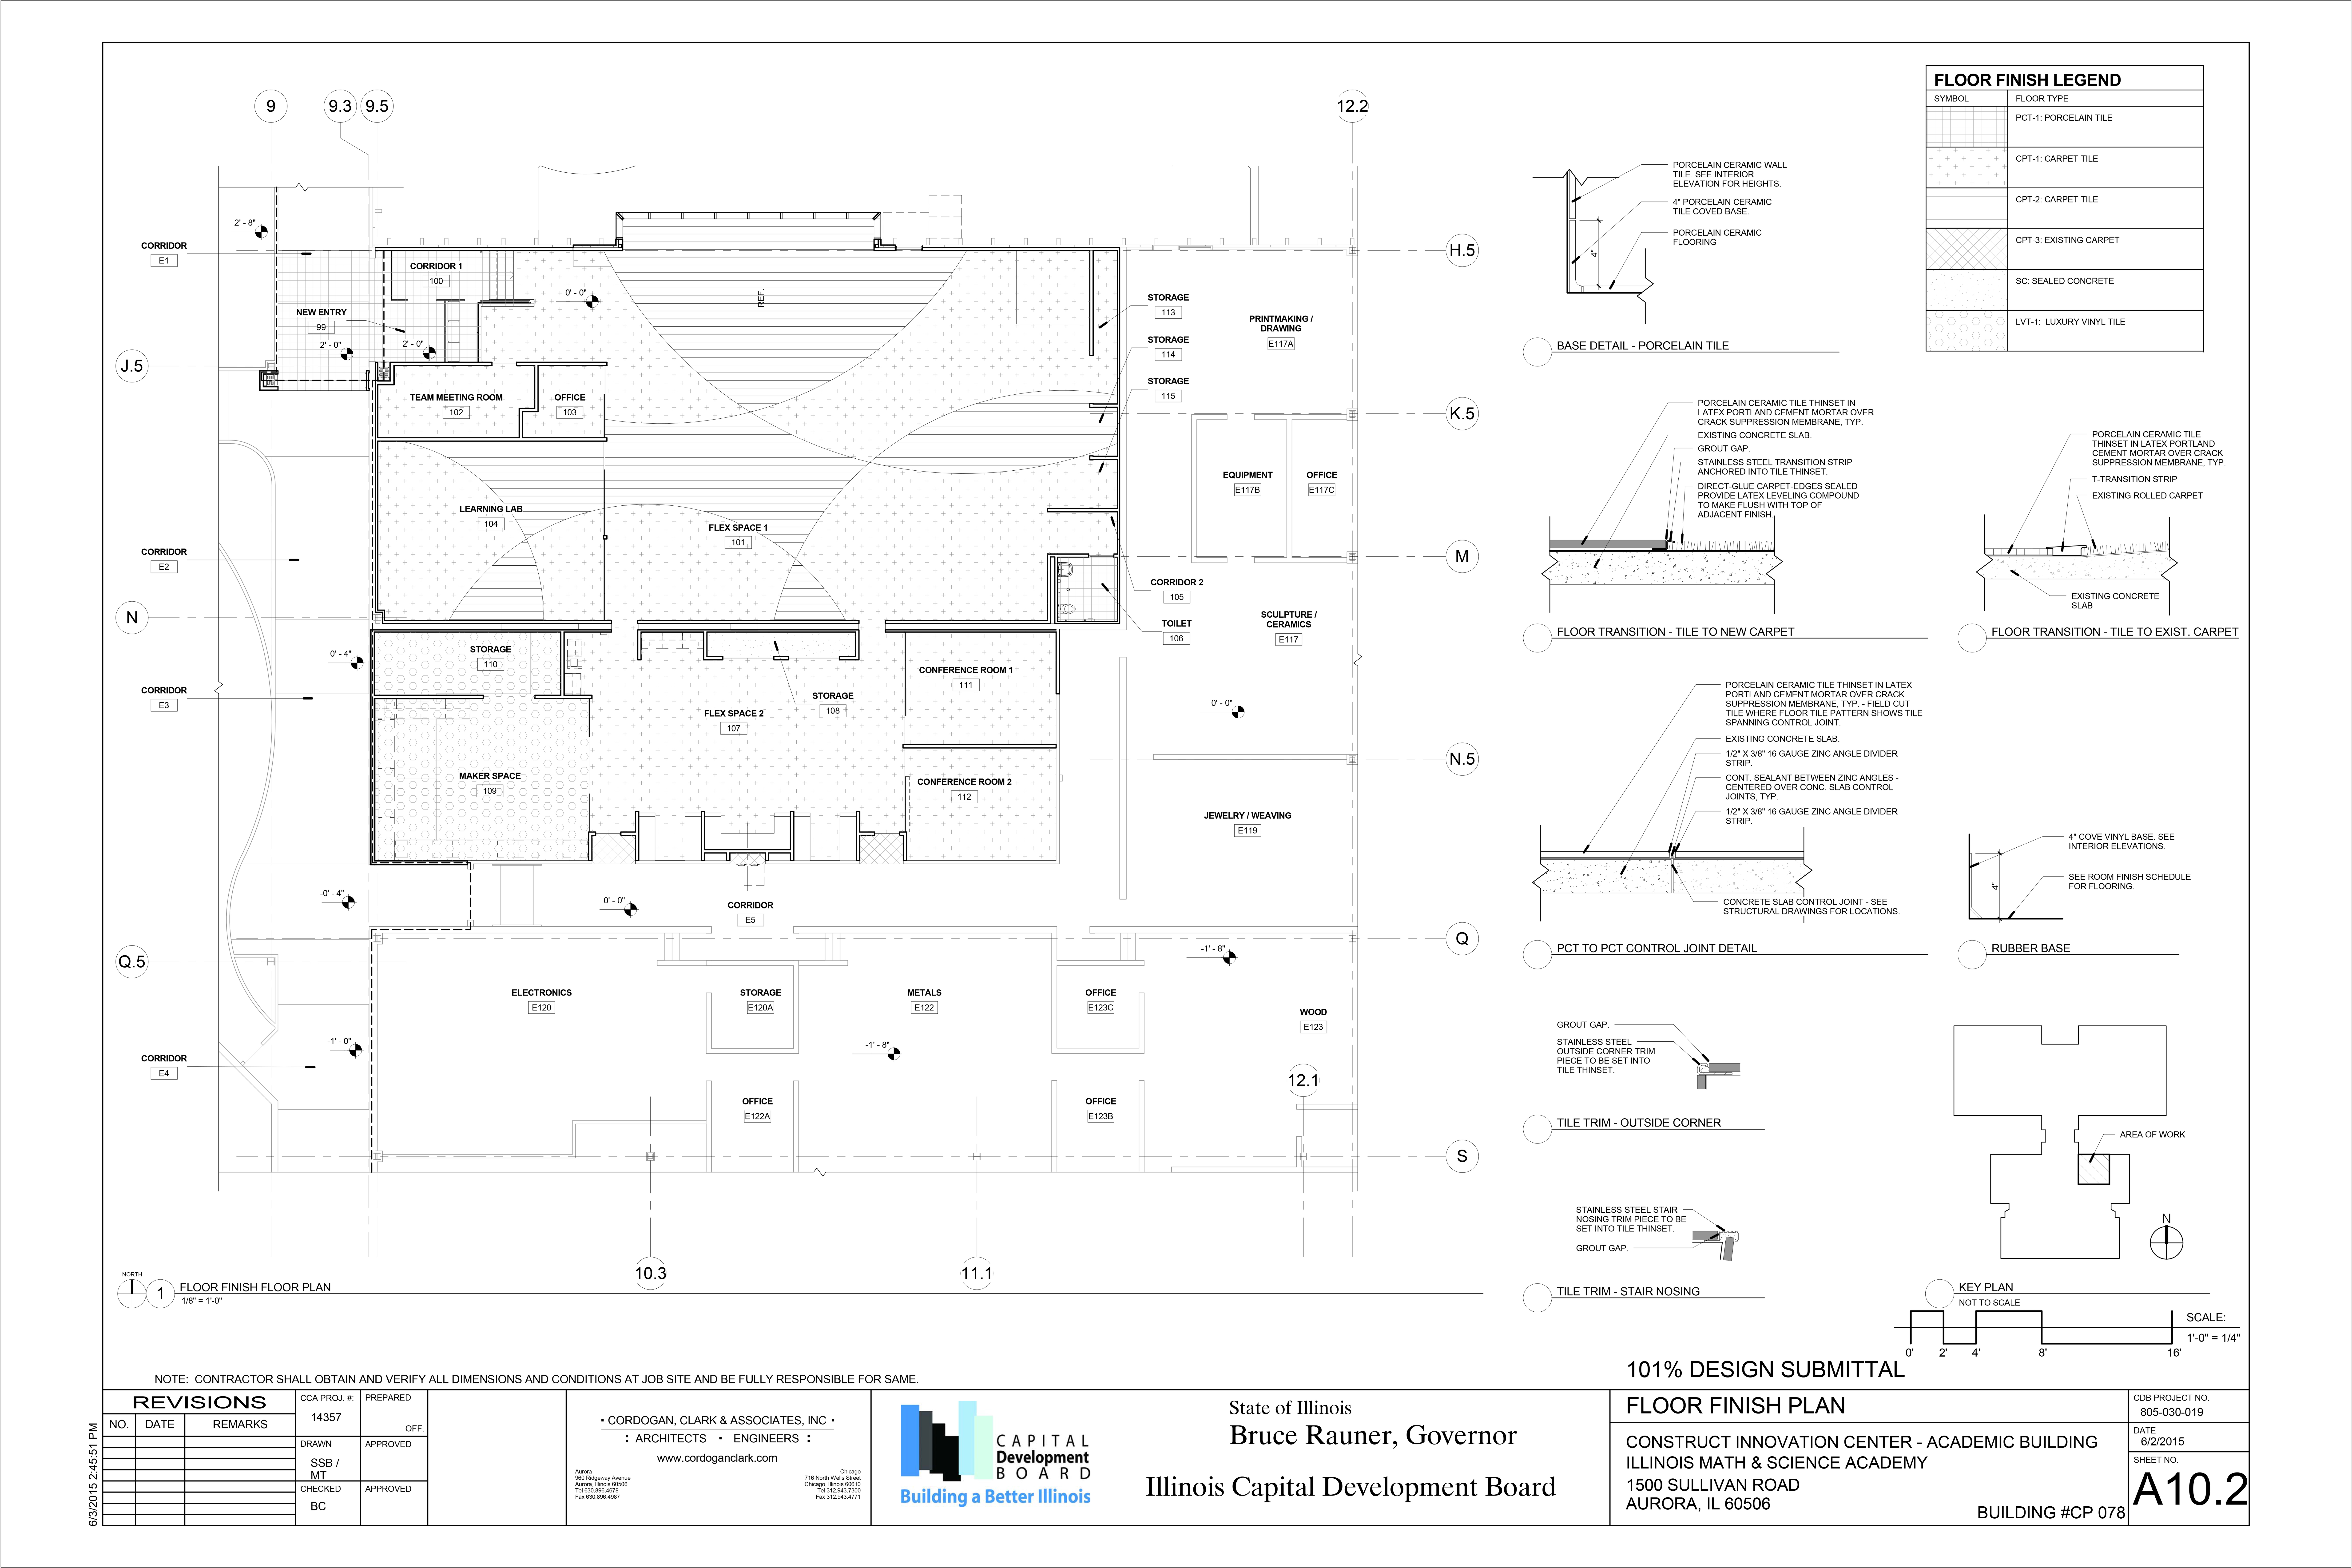 27 Floor Finish Plan By Cordogan